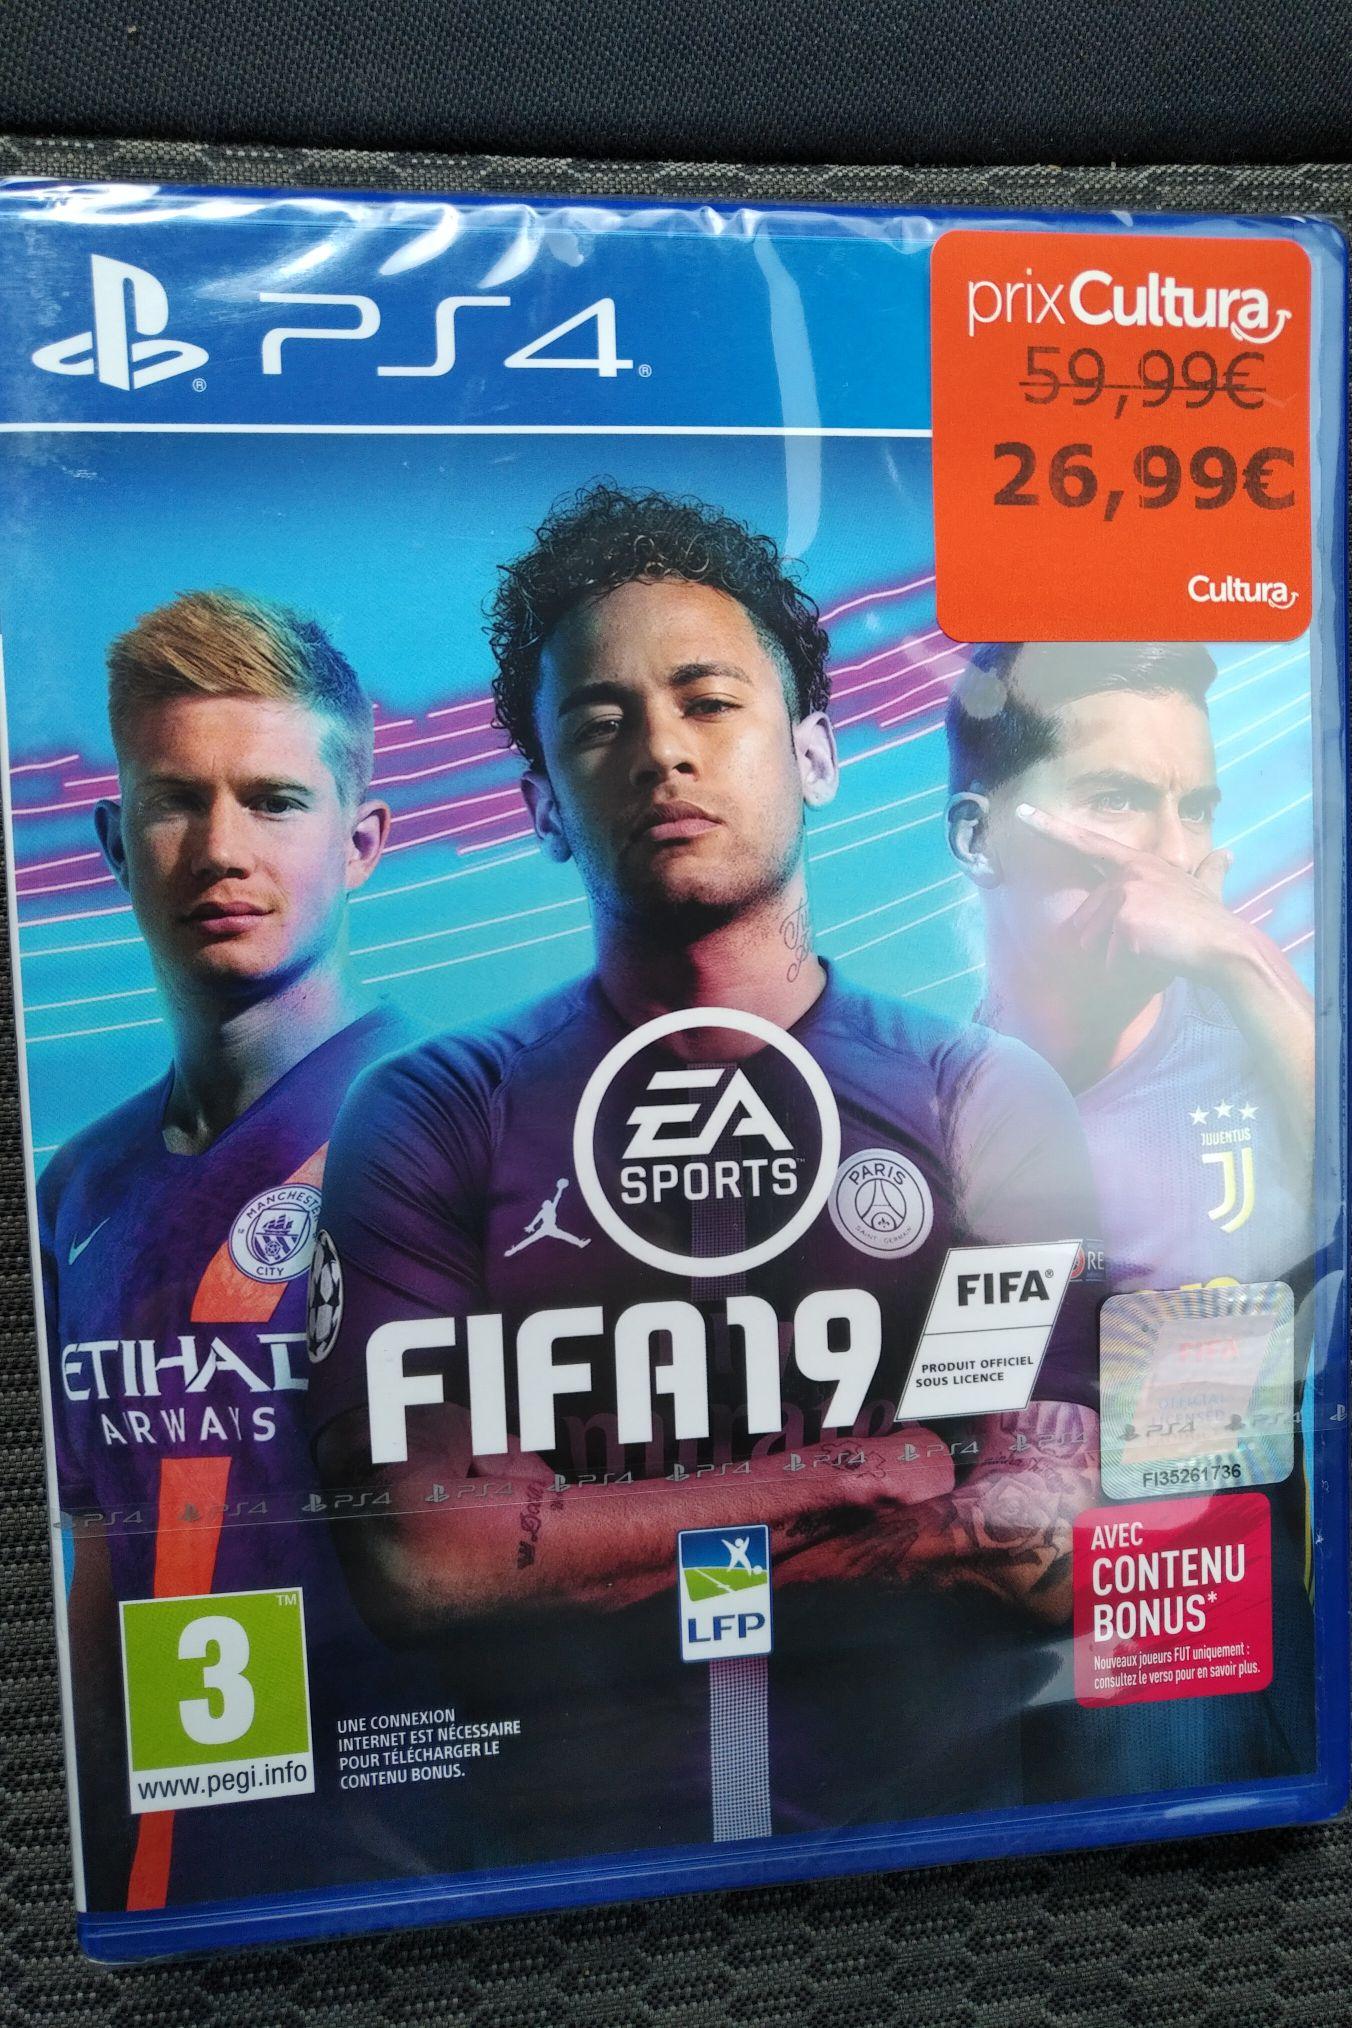 Jeu Fifa 19 sur PS4 - Cultura Aubagne (13)